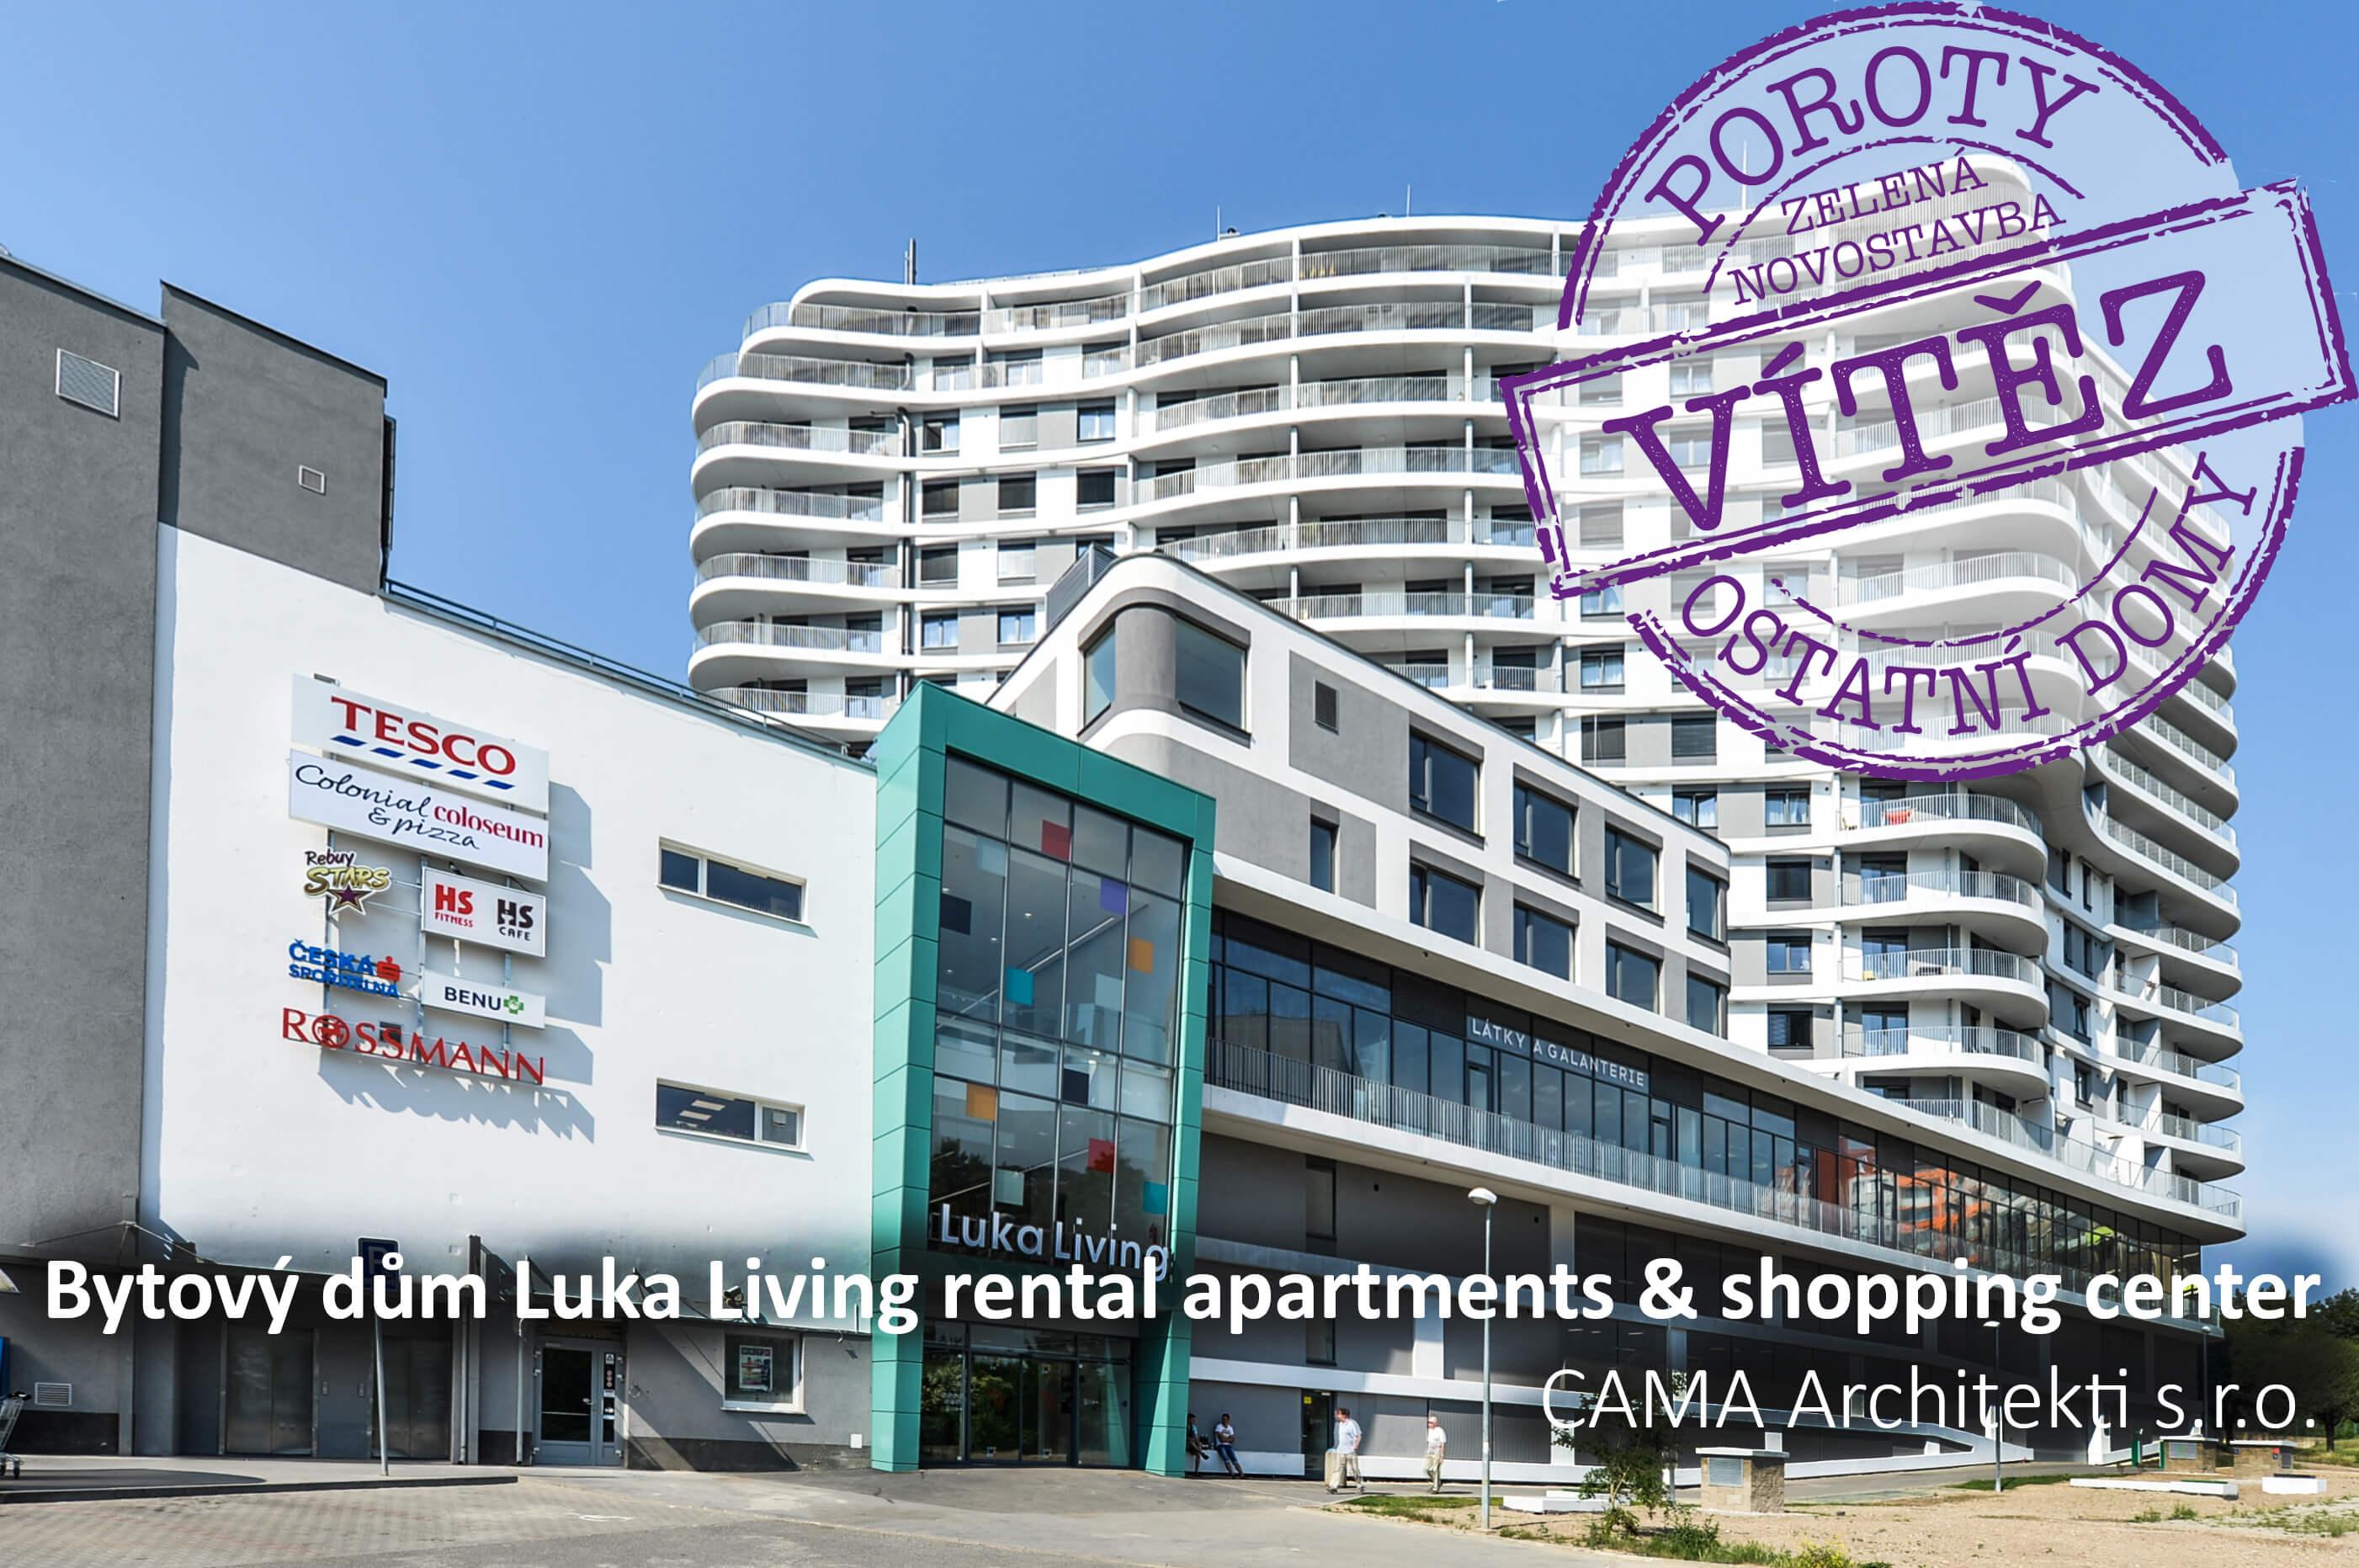 Luka Living rental apartments & shopping center